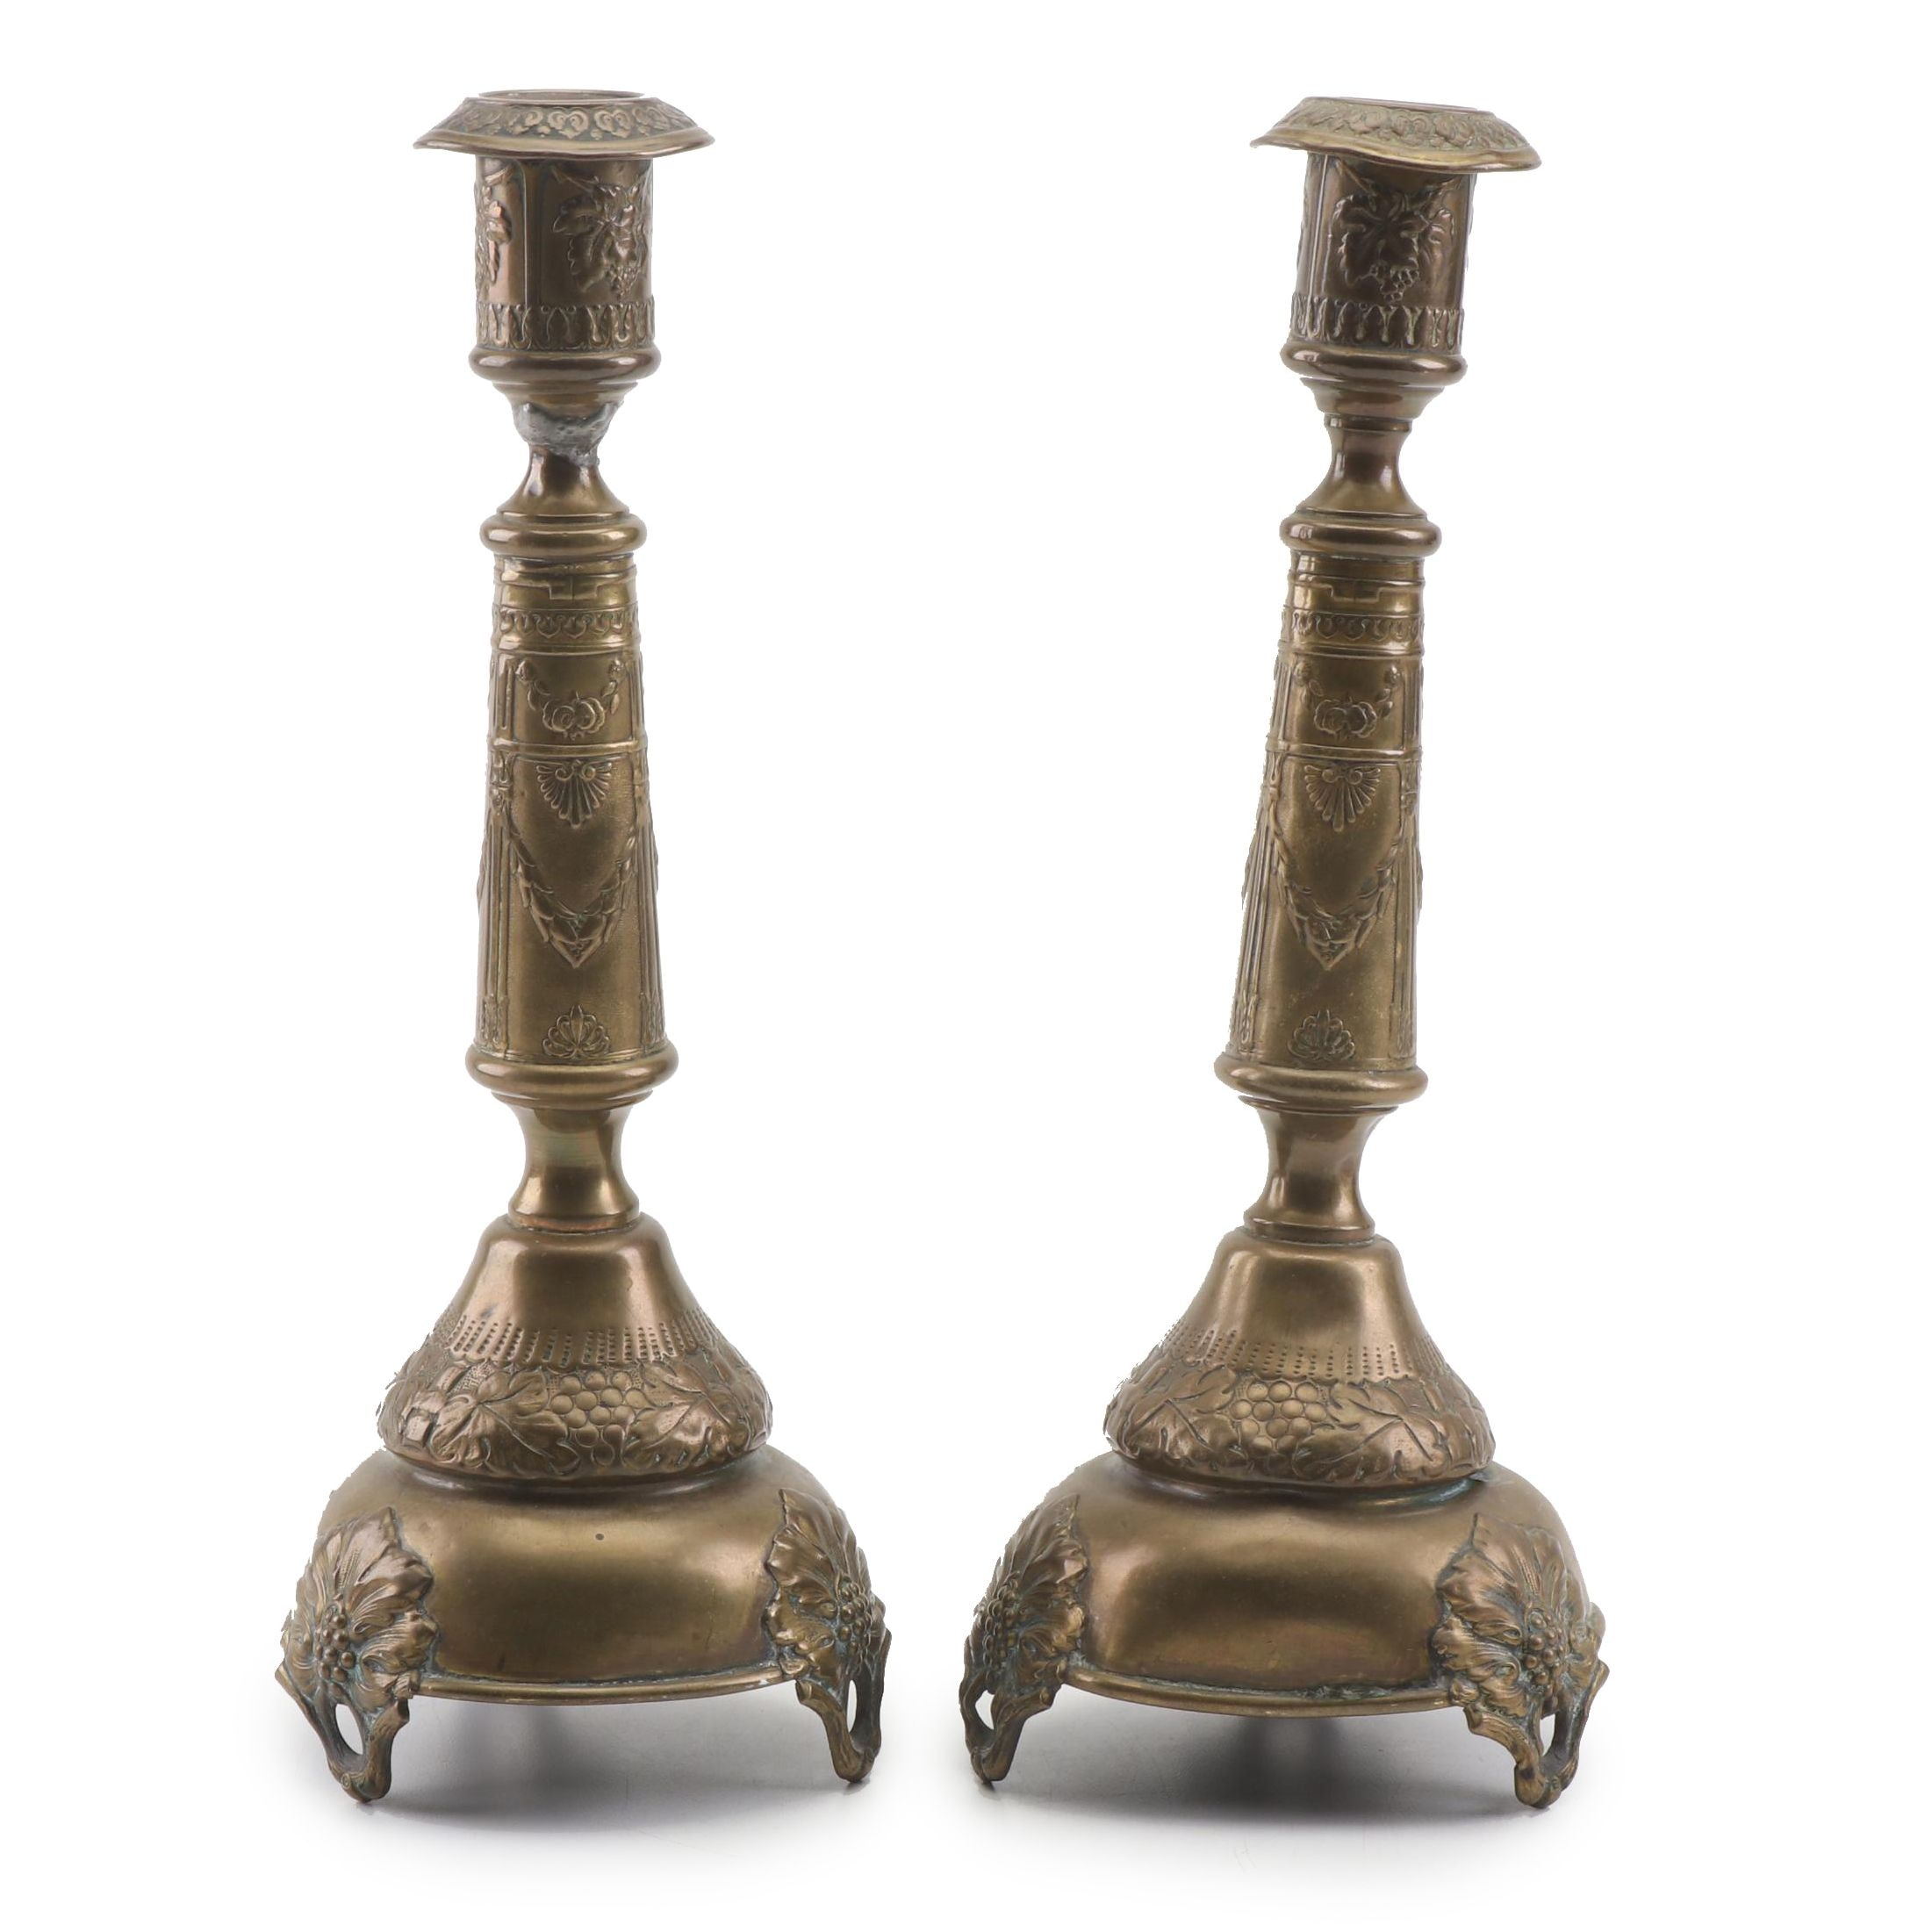 Polish M. Spiro Brass Candlesticks, Late 19th/Early 20th Century